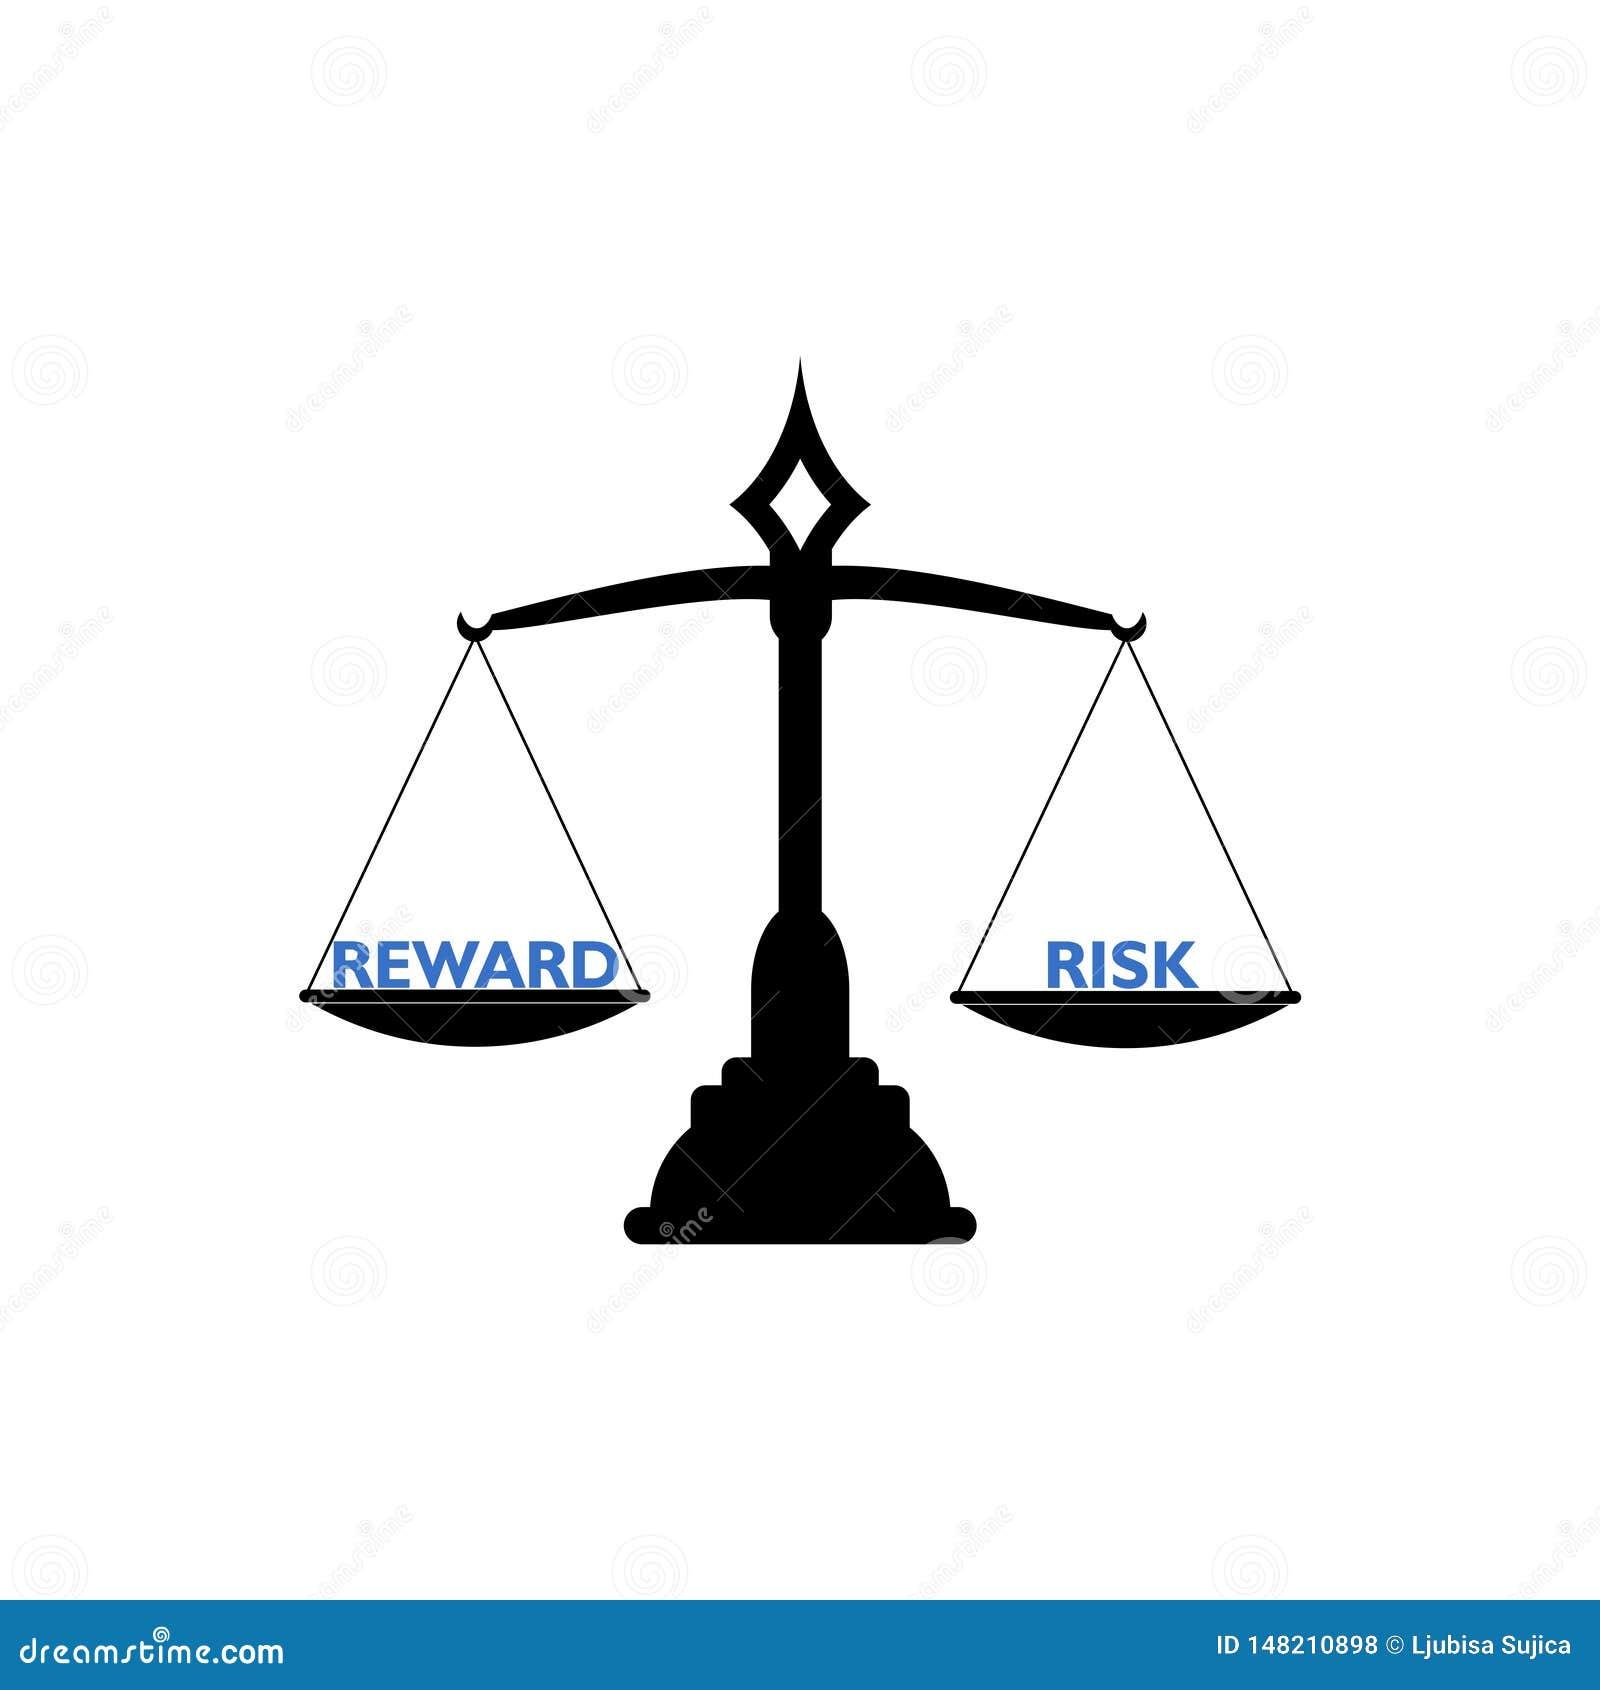 Seesaw balance between reward and risk, libra concept